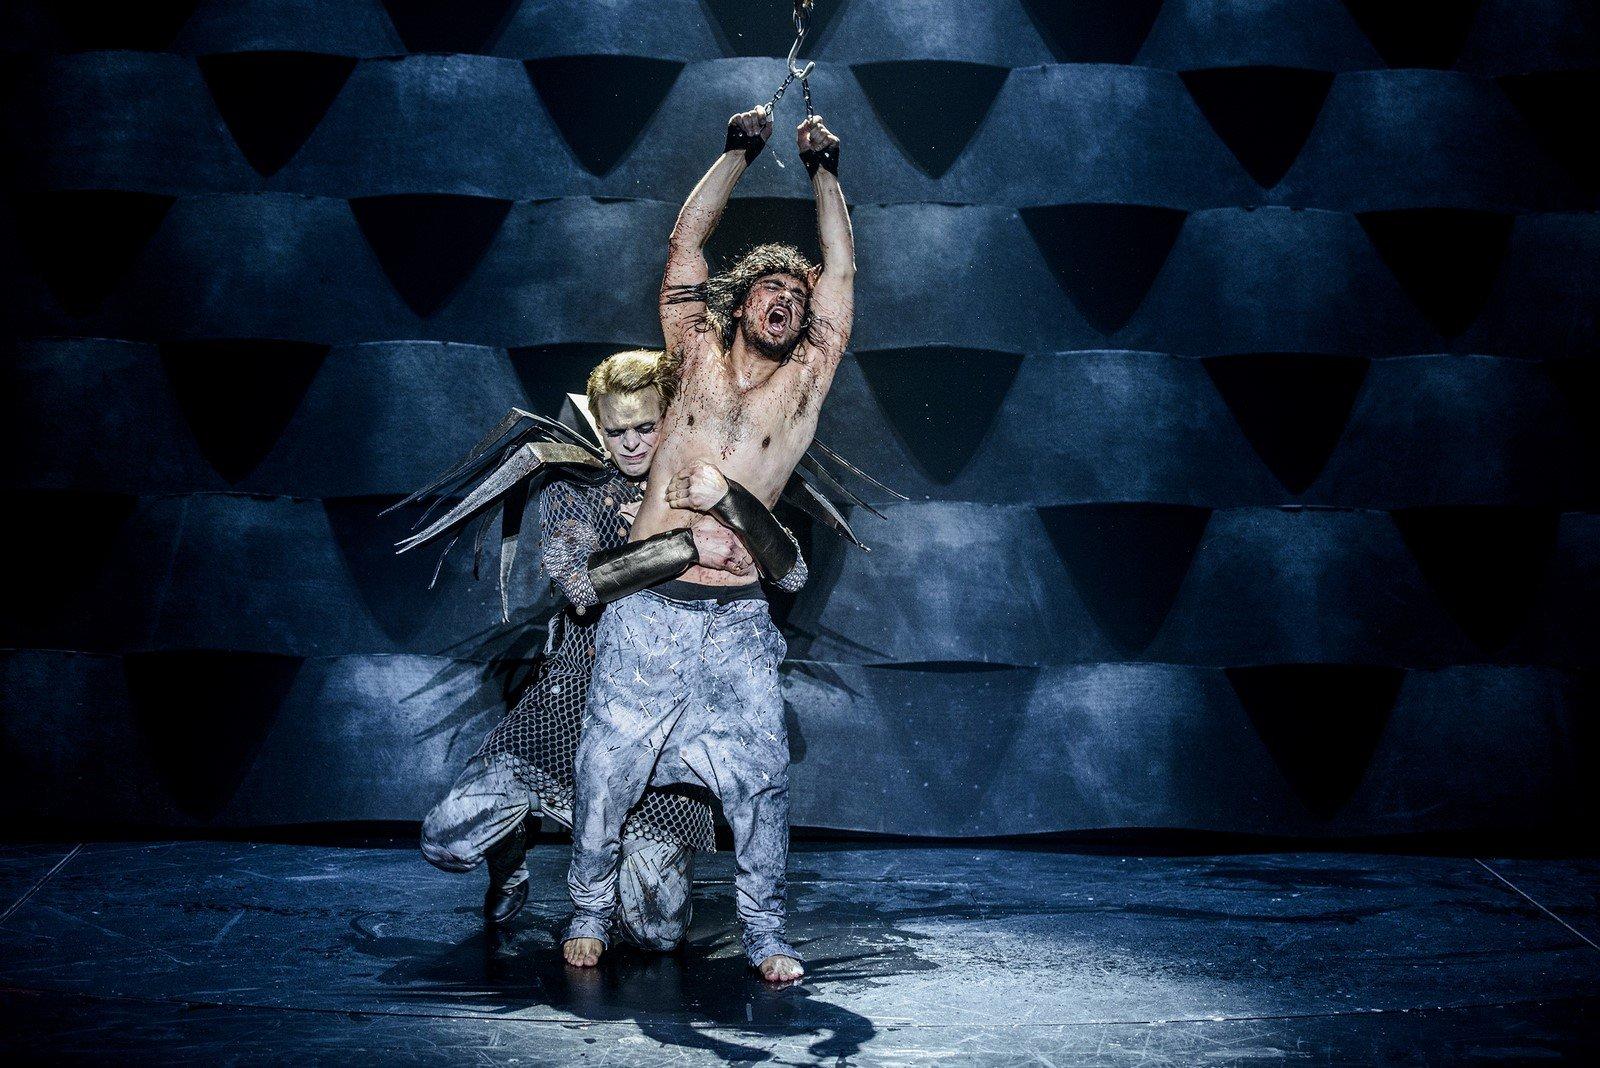 Anmeldelse: Jesus Christ Superstar, Aarhus Teater